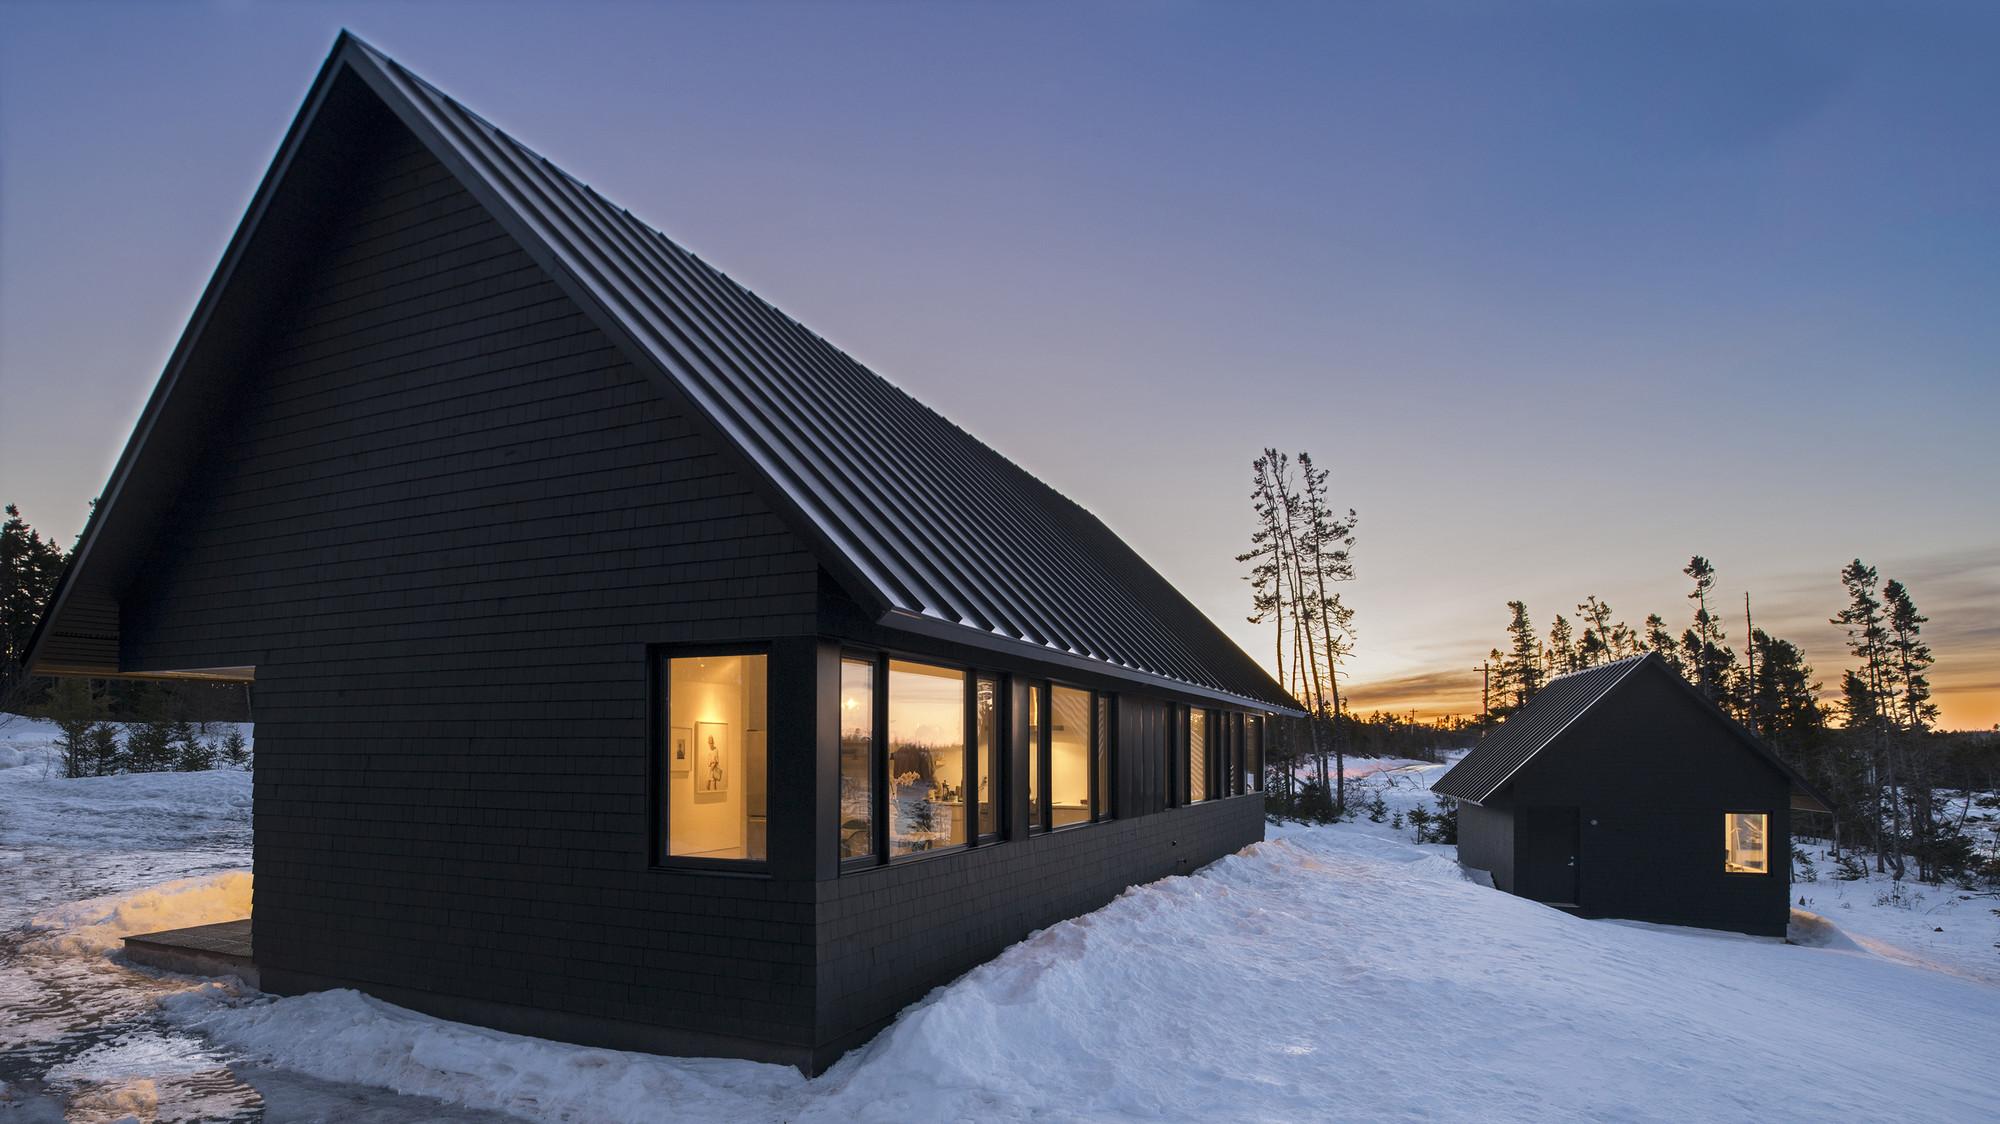 black gables omar gandhi architect archdaily. Black Bedroom Furniture Sets. Home Design Ideas